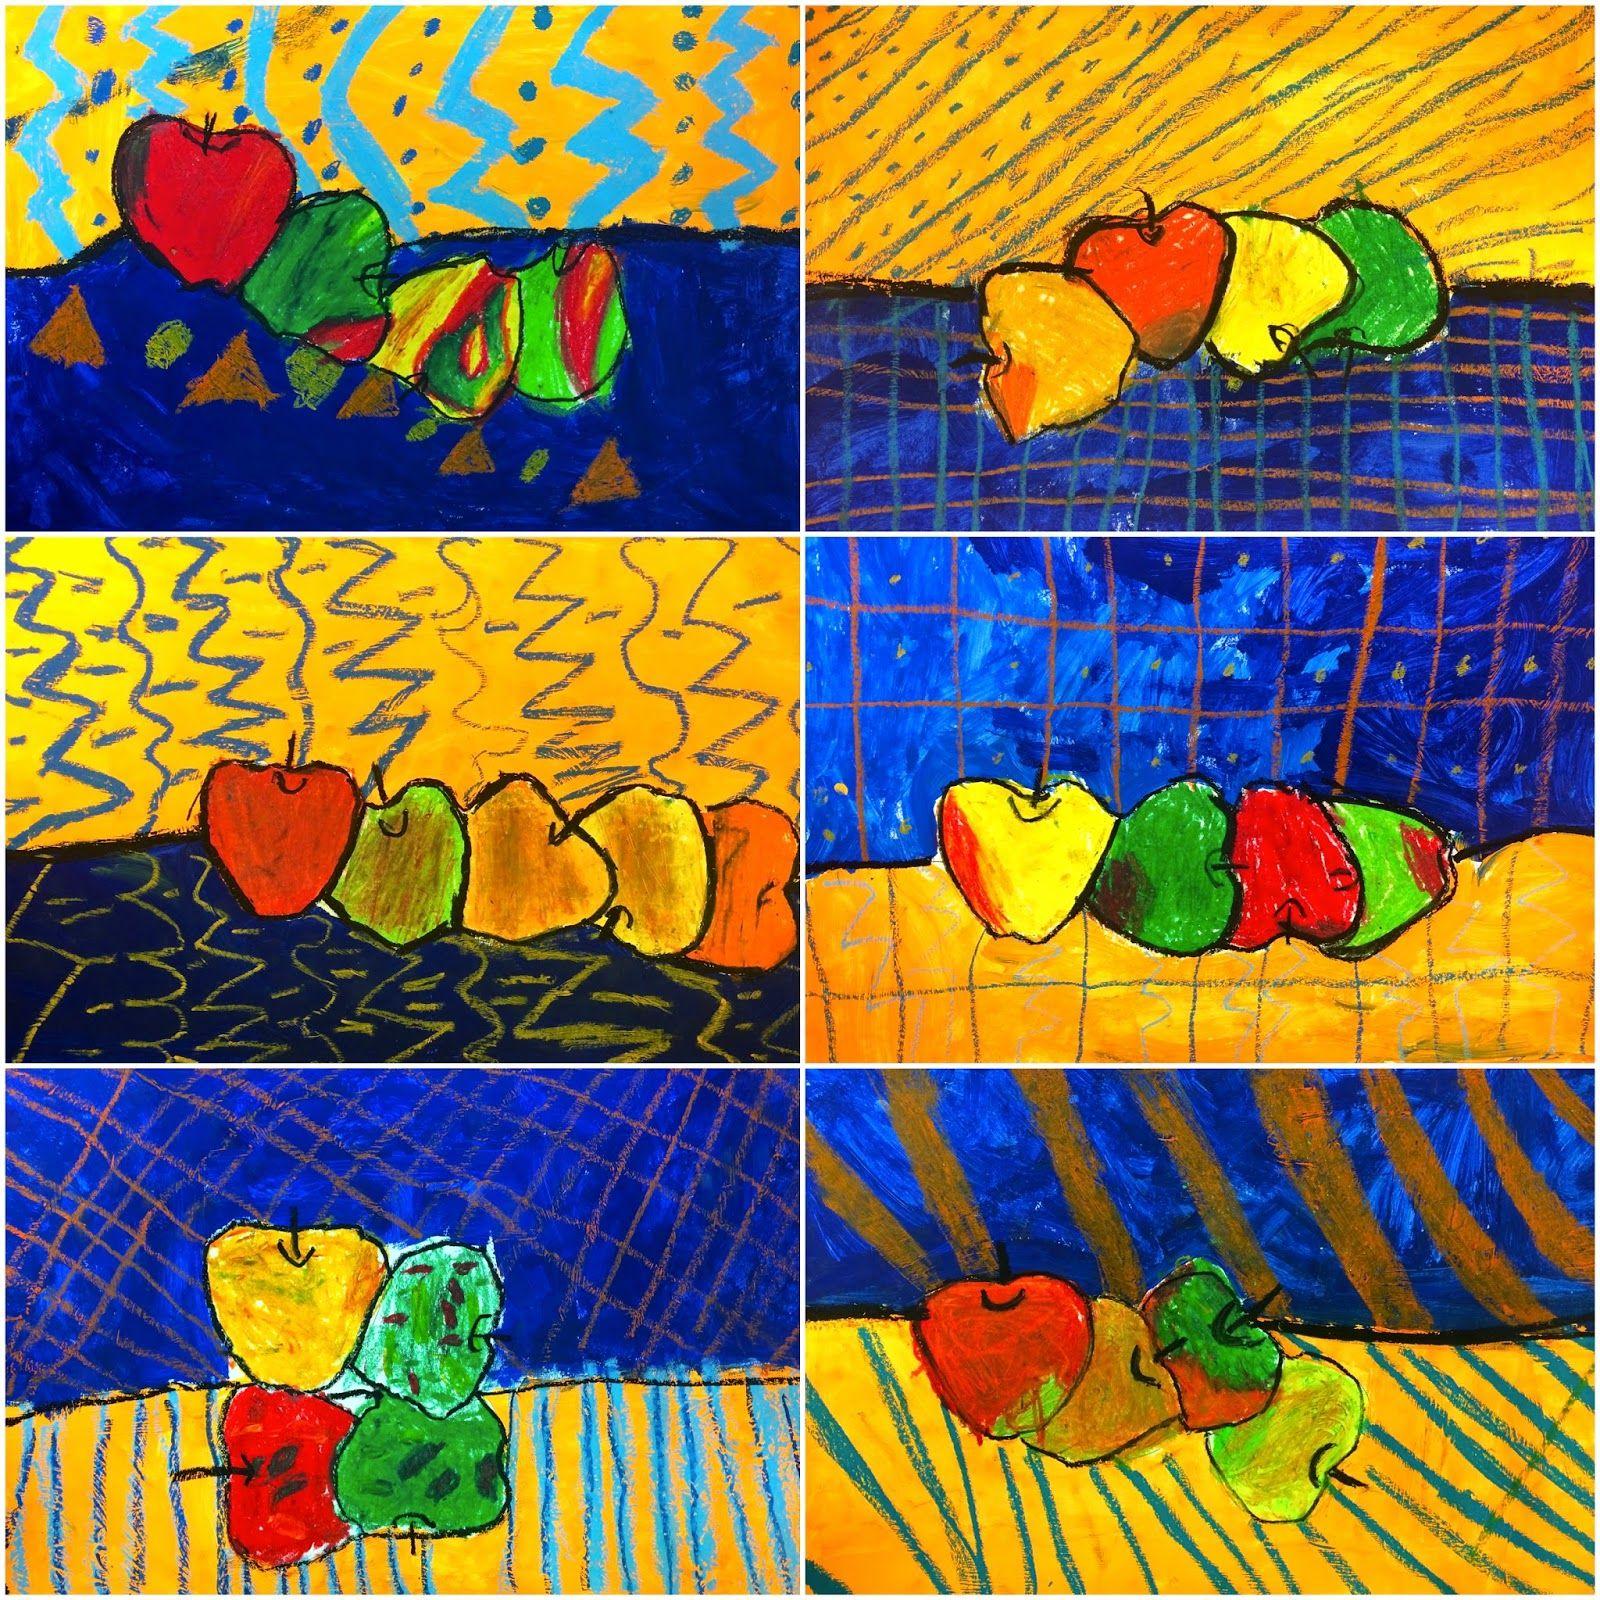 Exploring Art Elementary Art 1st Grade Paul Cezanne Apple Still Life